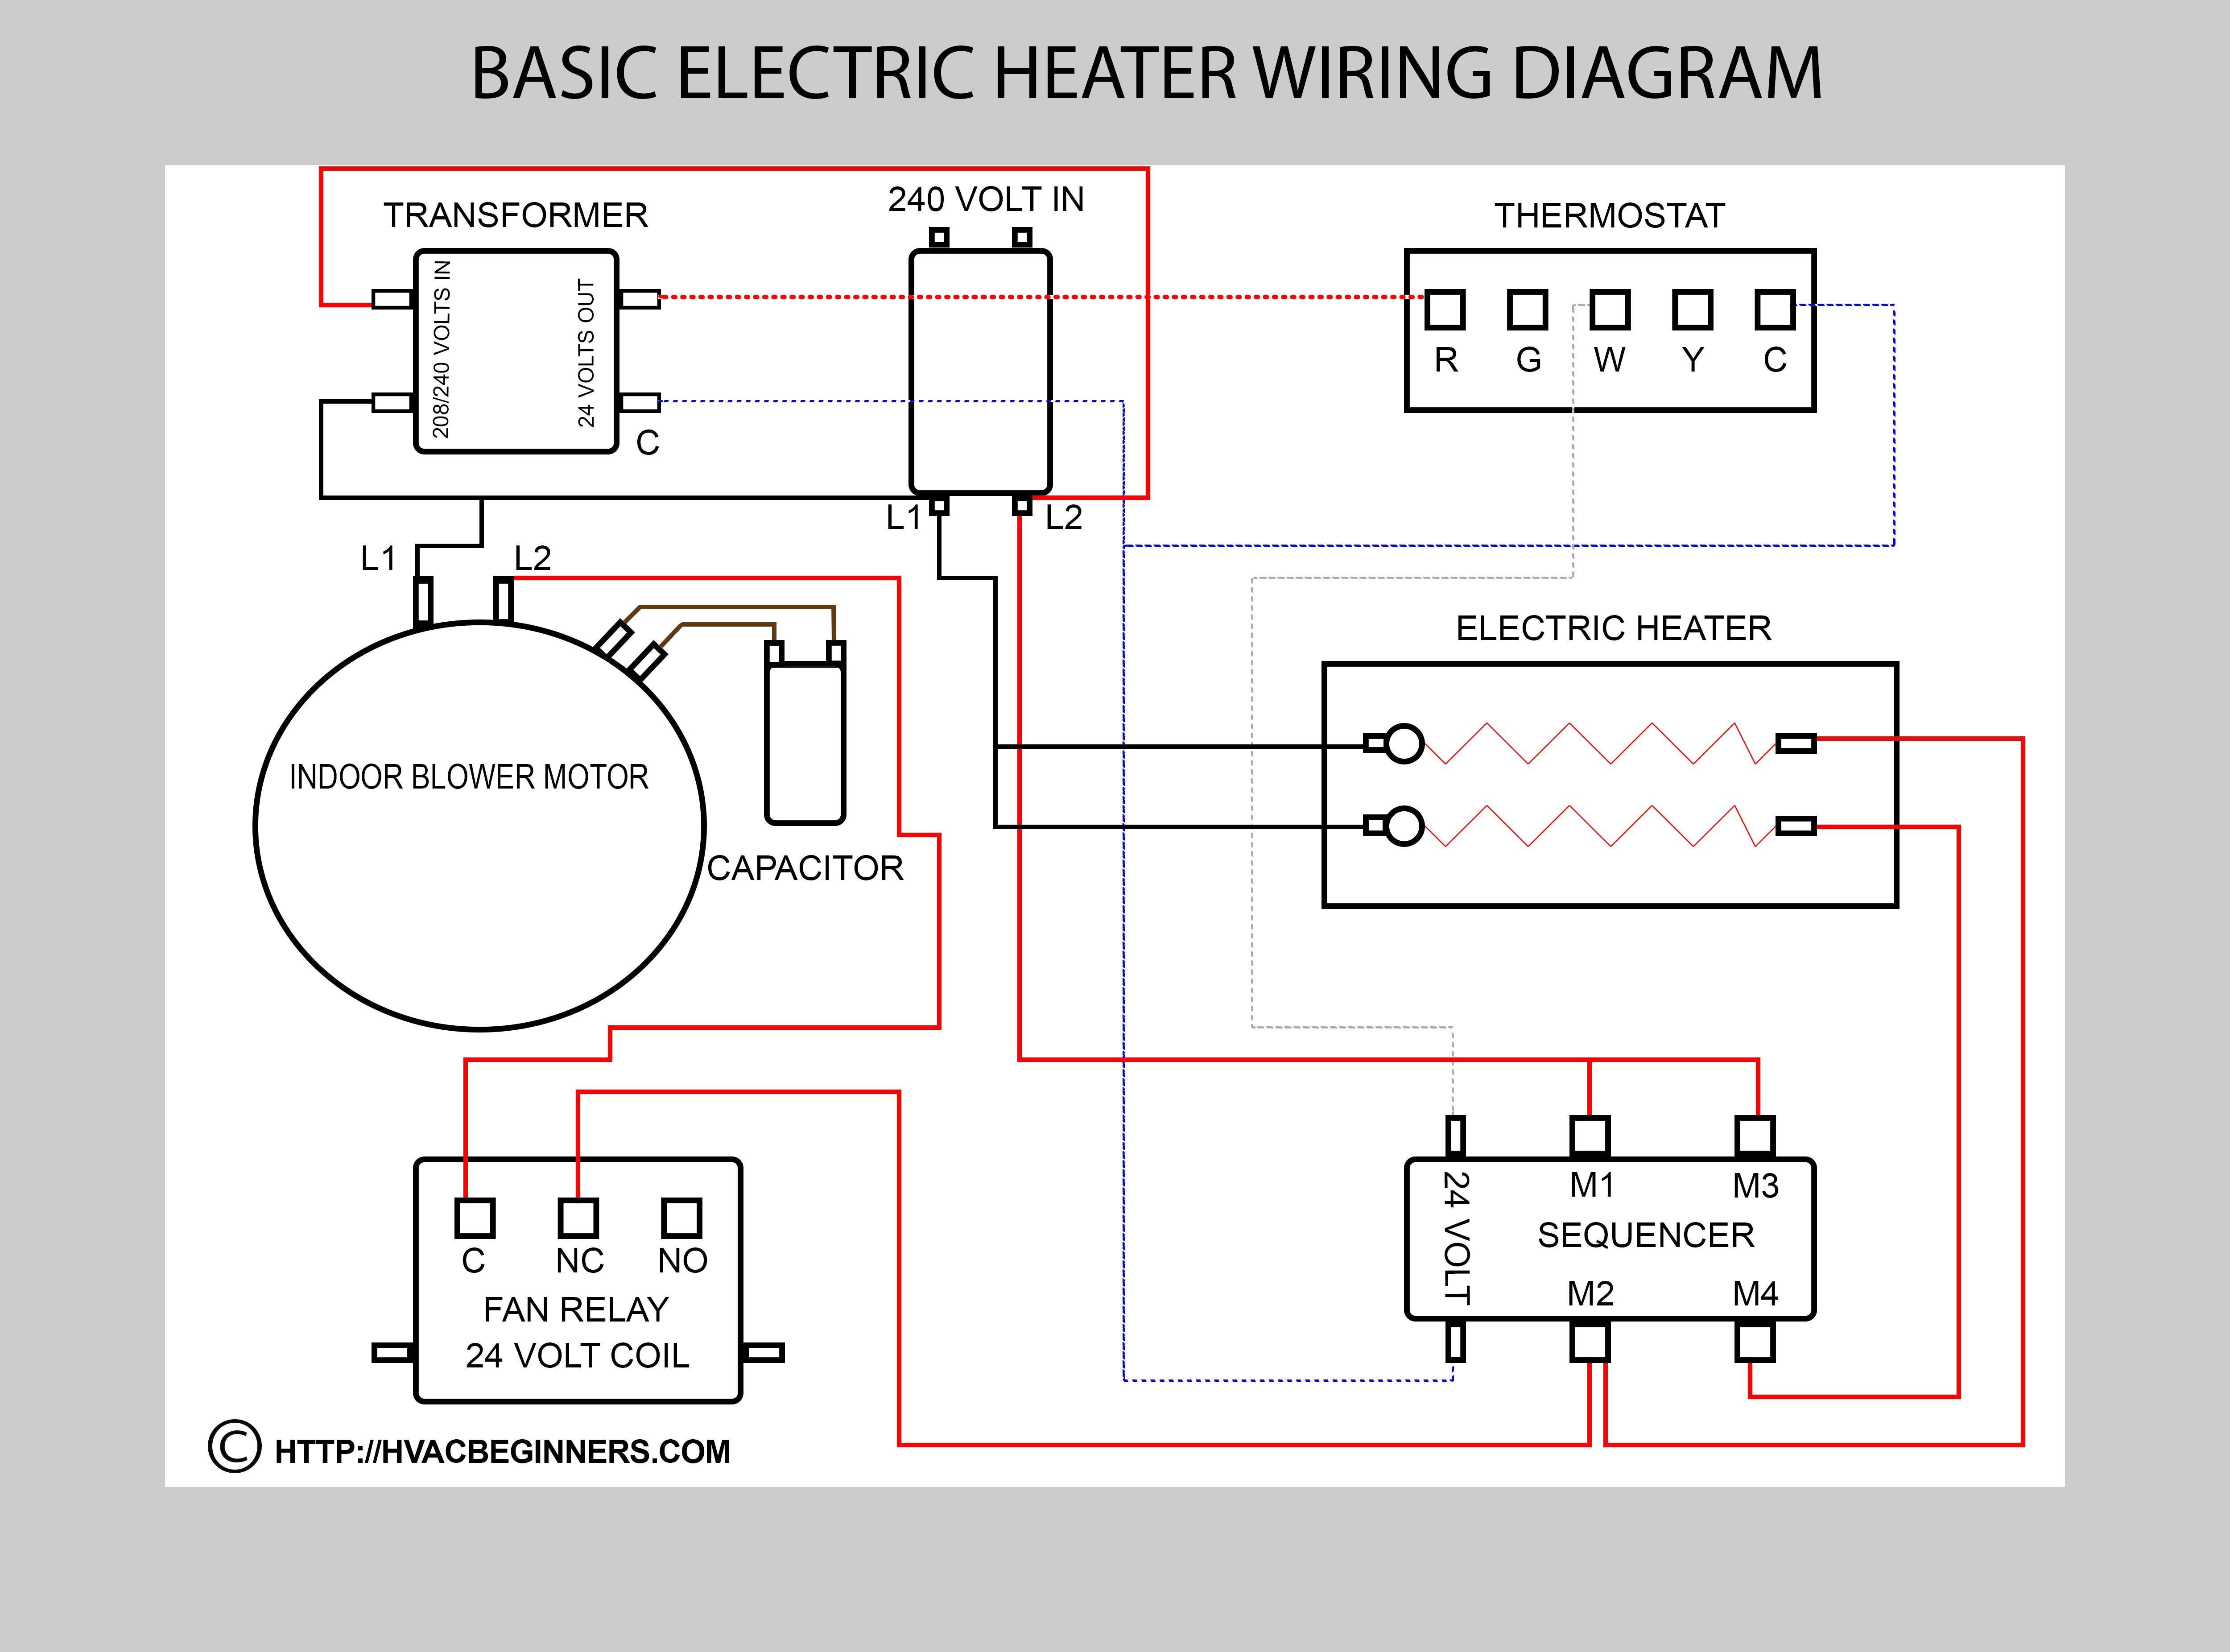 armstrong air handler wiring diagram Download-package unit wiring diagram wiring diagram darren criss wire center u2022 rh lakitiki co Payne Air 10-r